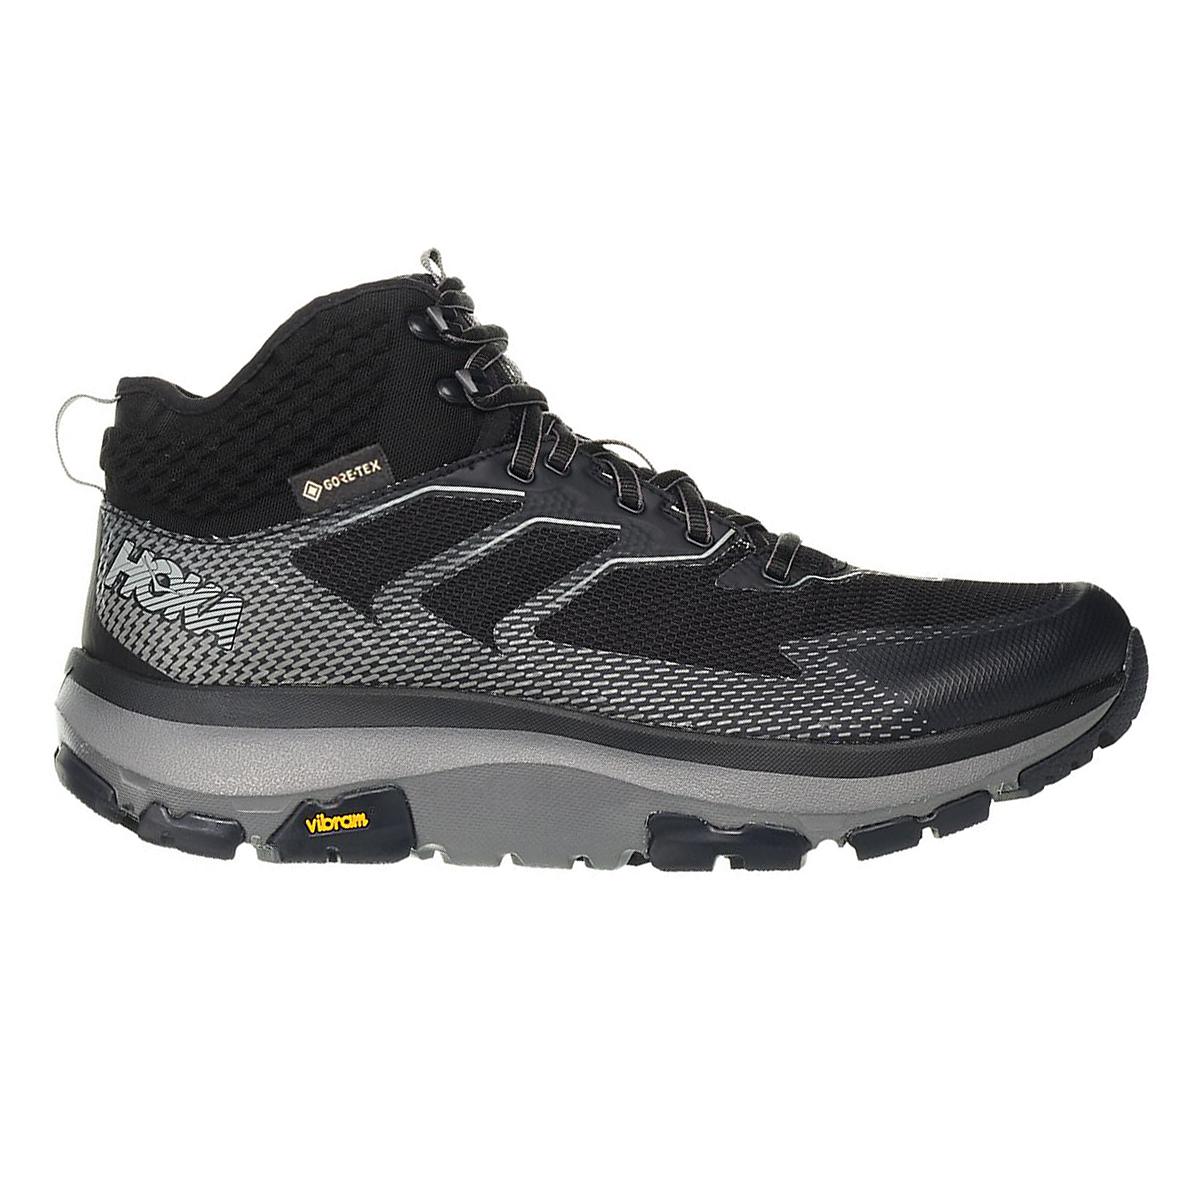 Men's Hoka One One Sky Toa Gore-Tex Trail Running Shoe - Color: Phantom - Size: 7 - Width: Regular, Phantom, large, image 1